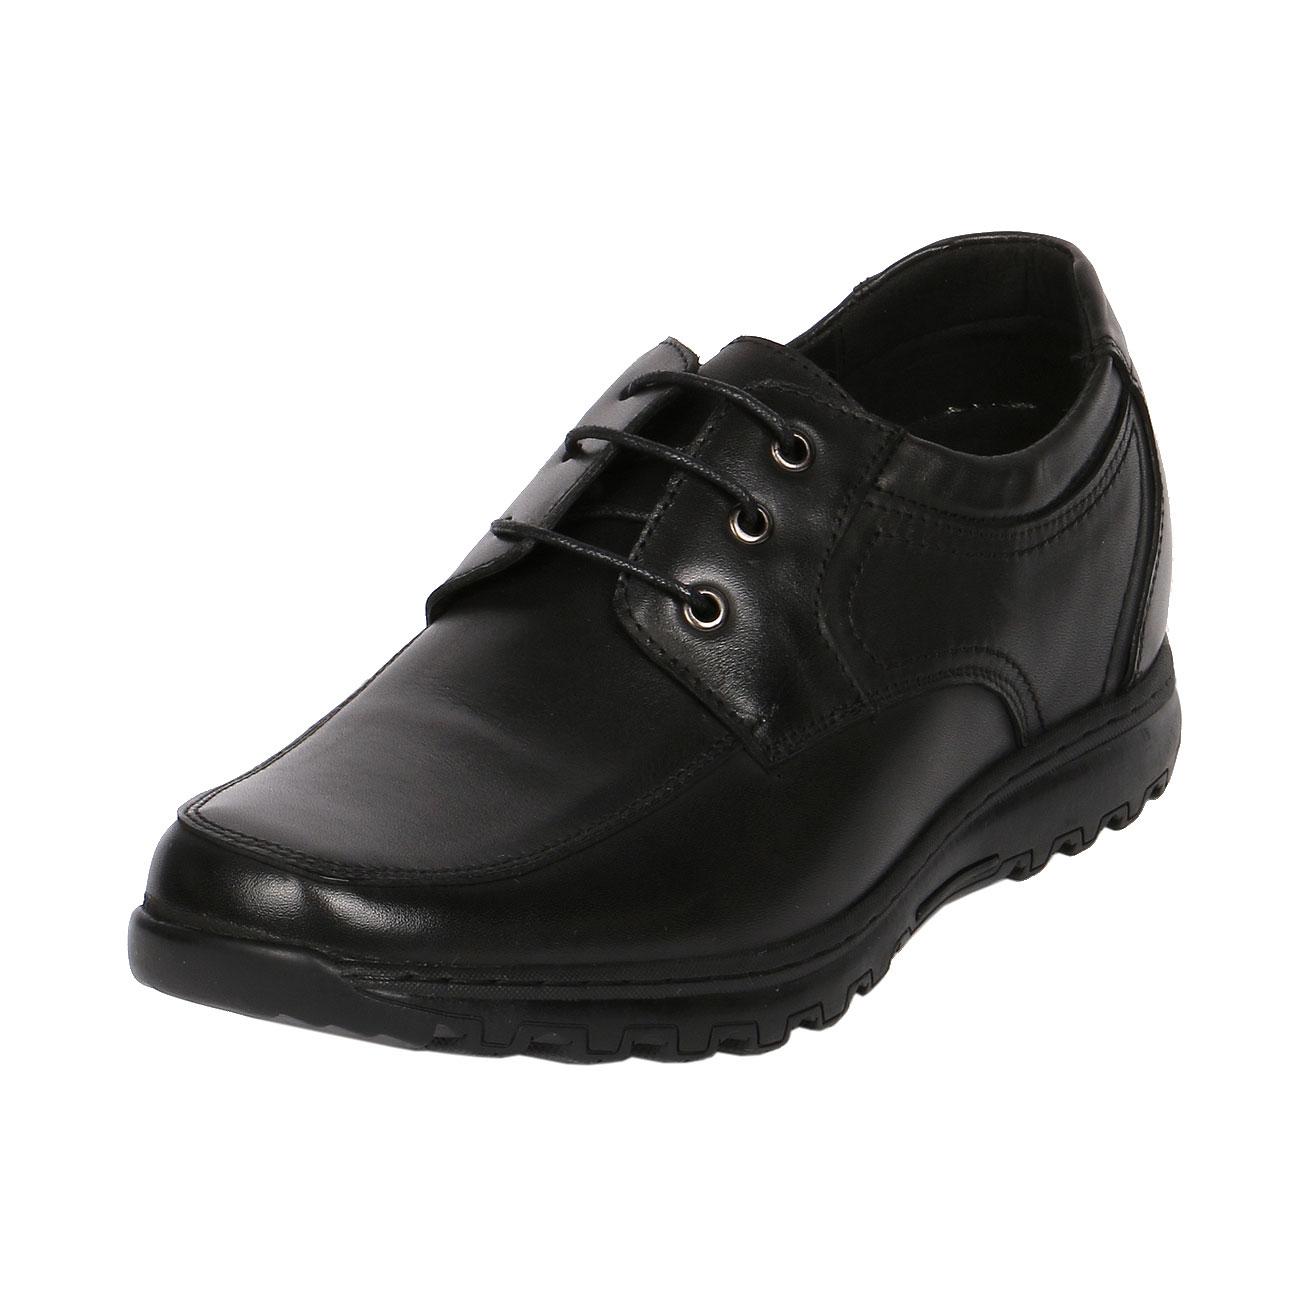 Men's Combination Semi Dressy & Casual Apron Shoes 2.8